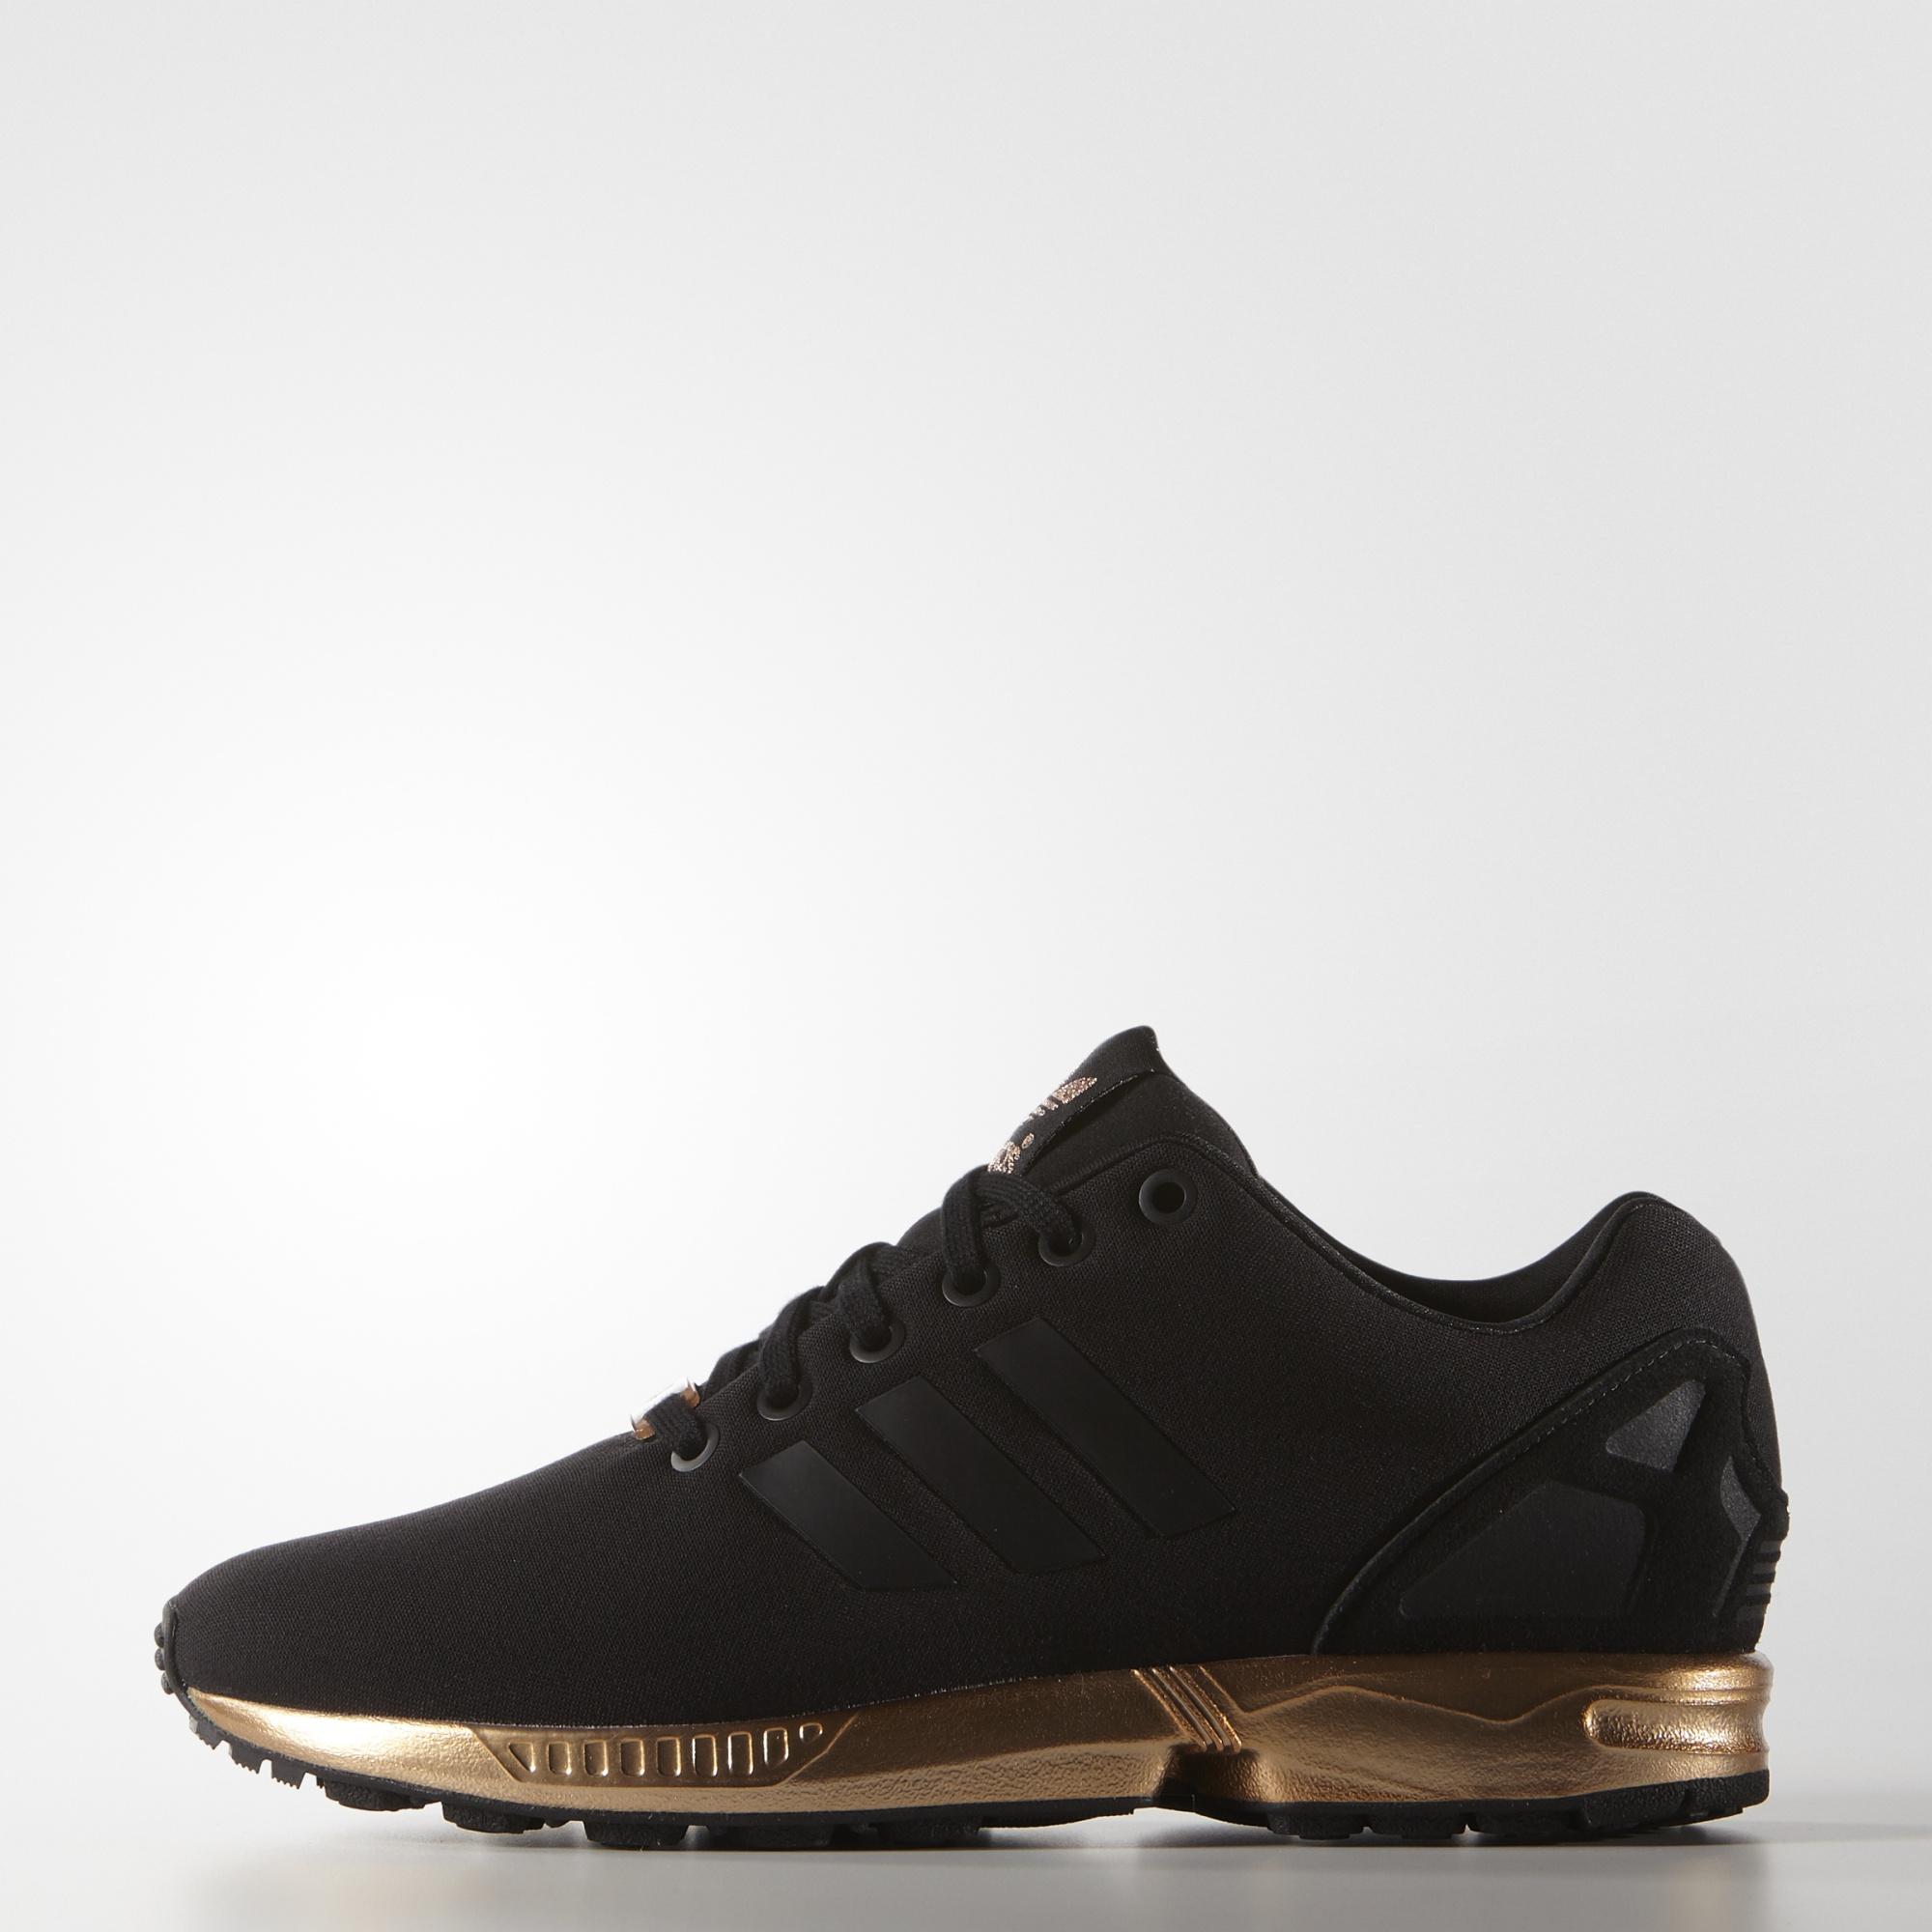 Adidas Flux Gold